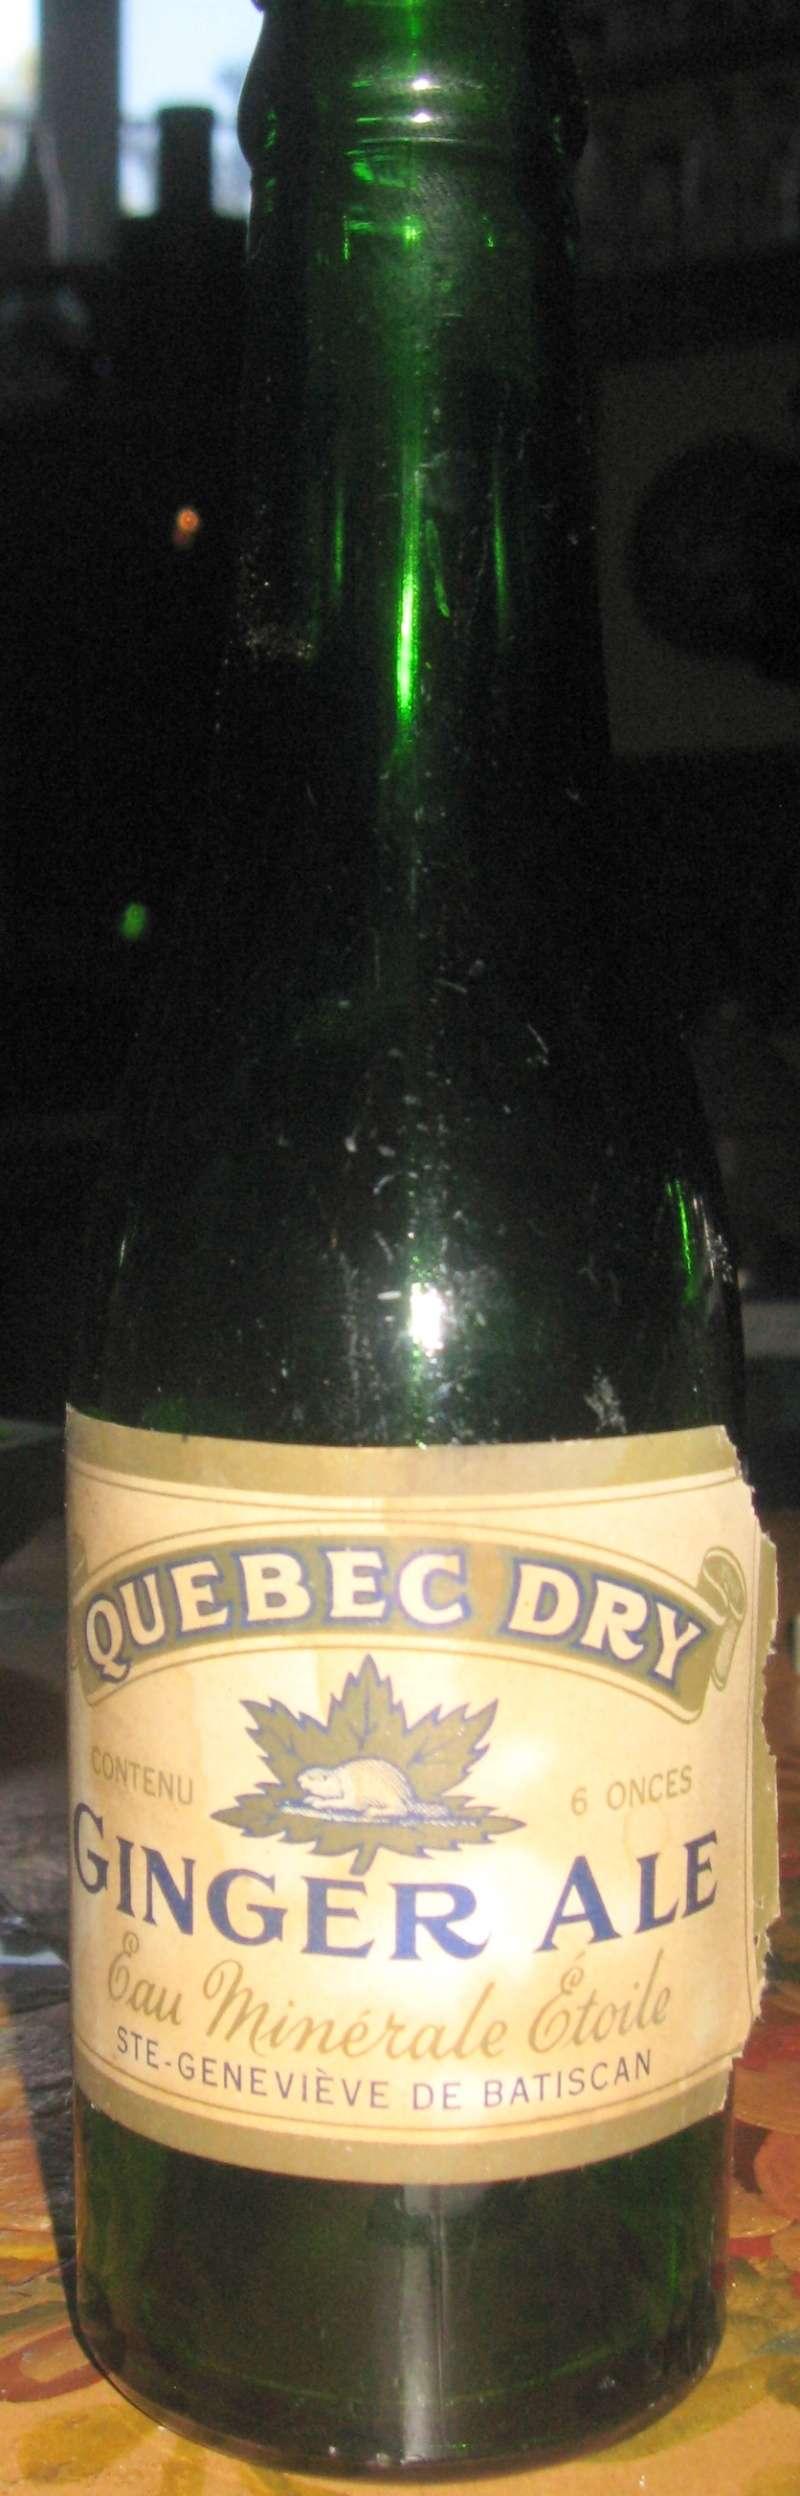 quebec dry  ginger ale  ste-genevieve de batiscan  Etoile10